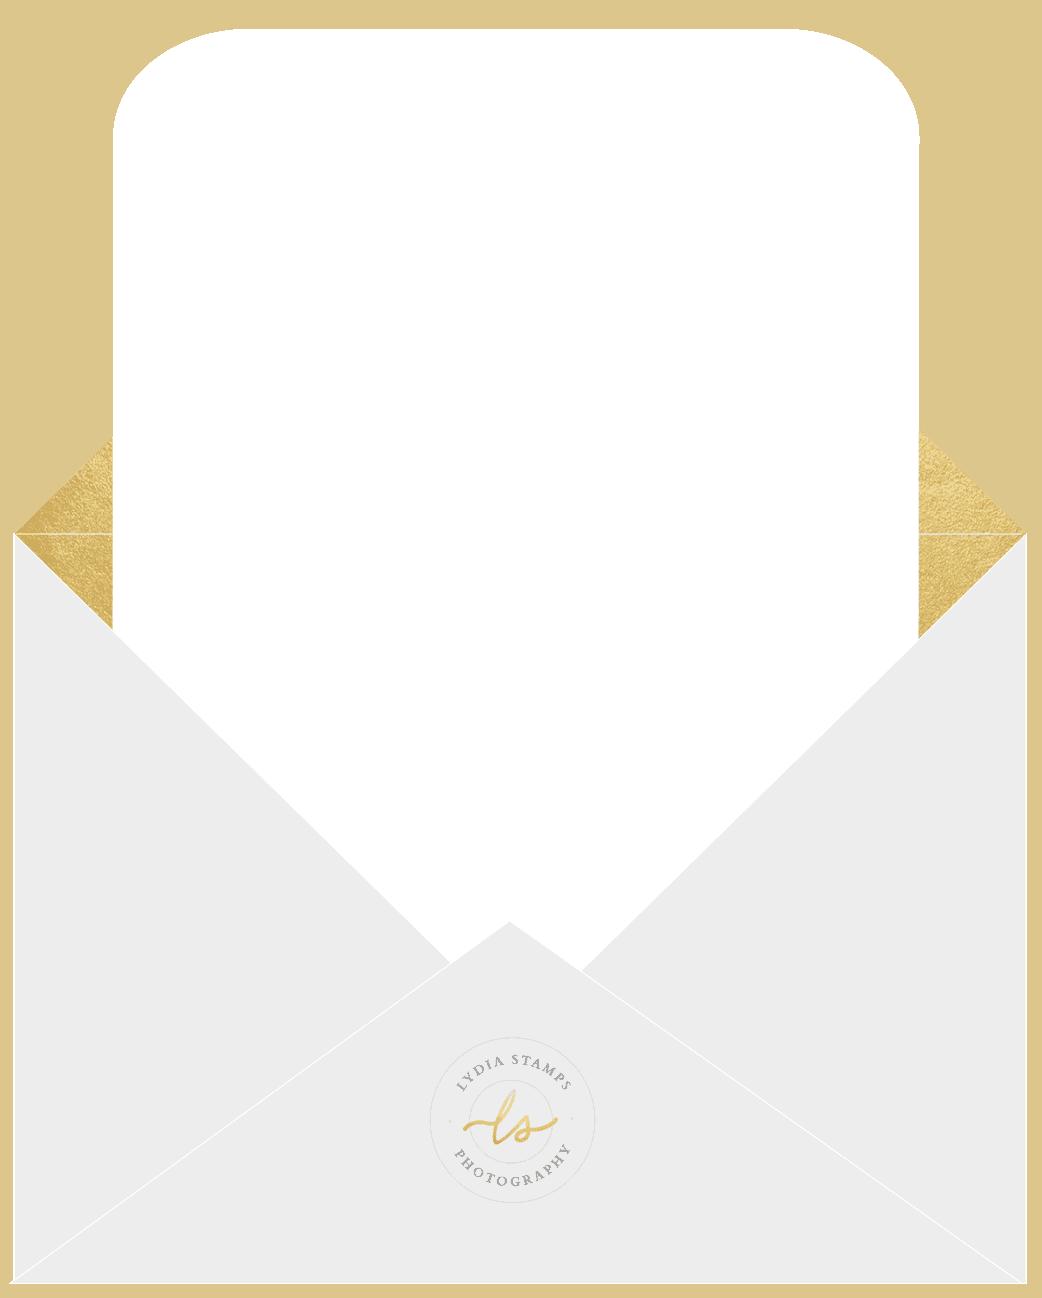 lydia stamps envelope background